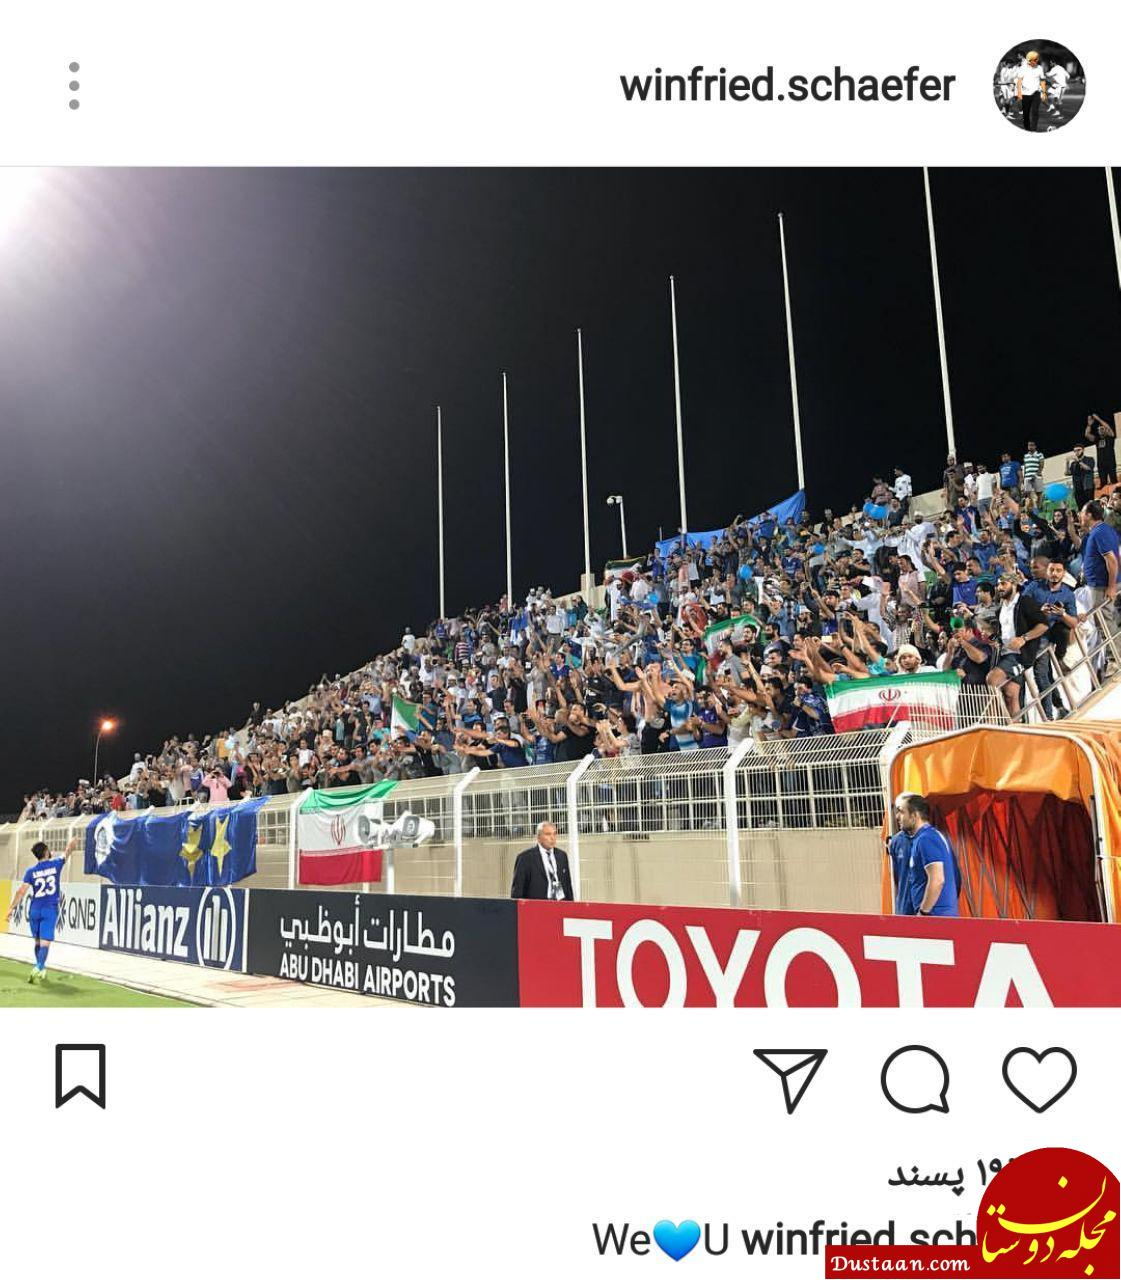 www.dustaan.com پست اینستاگرامی شفر پس از برد شیرین مقابل الهلال عربستان +عکس